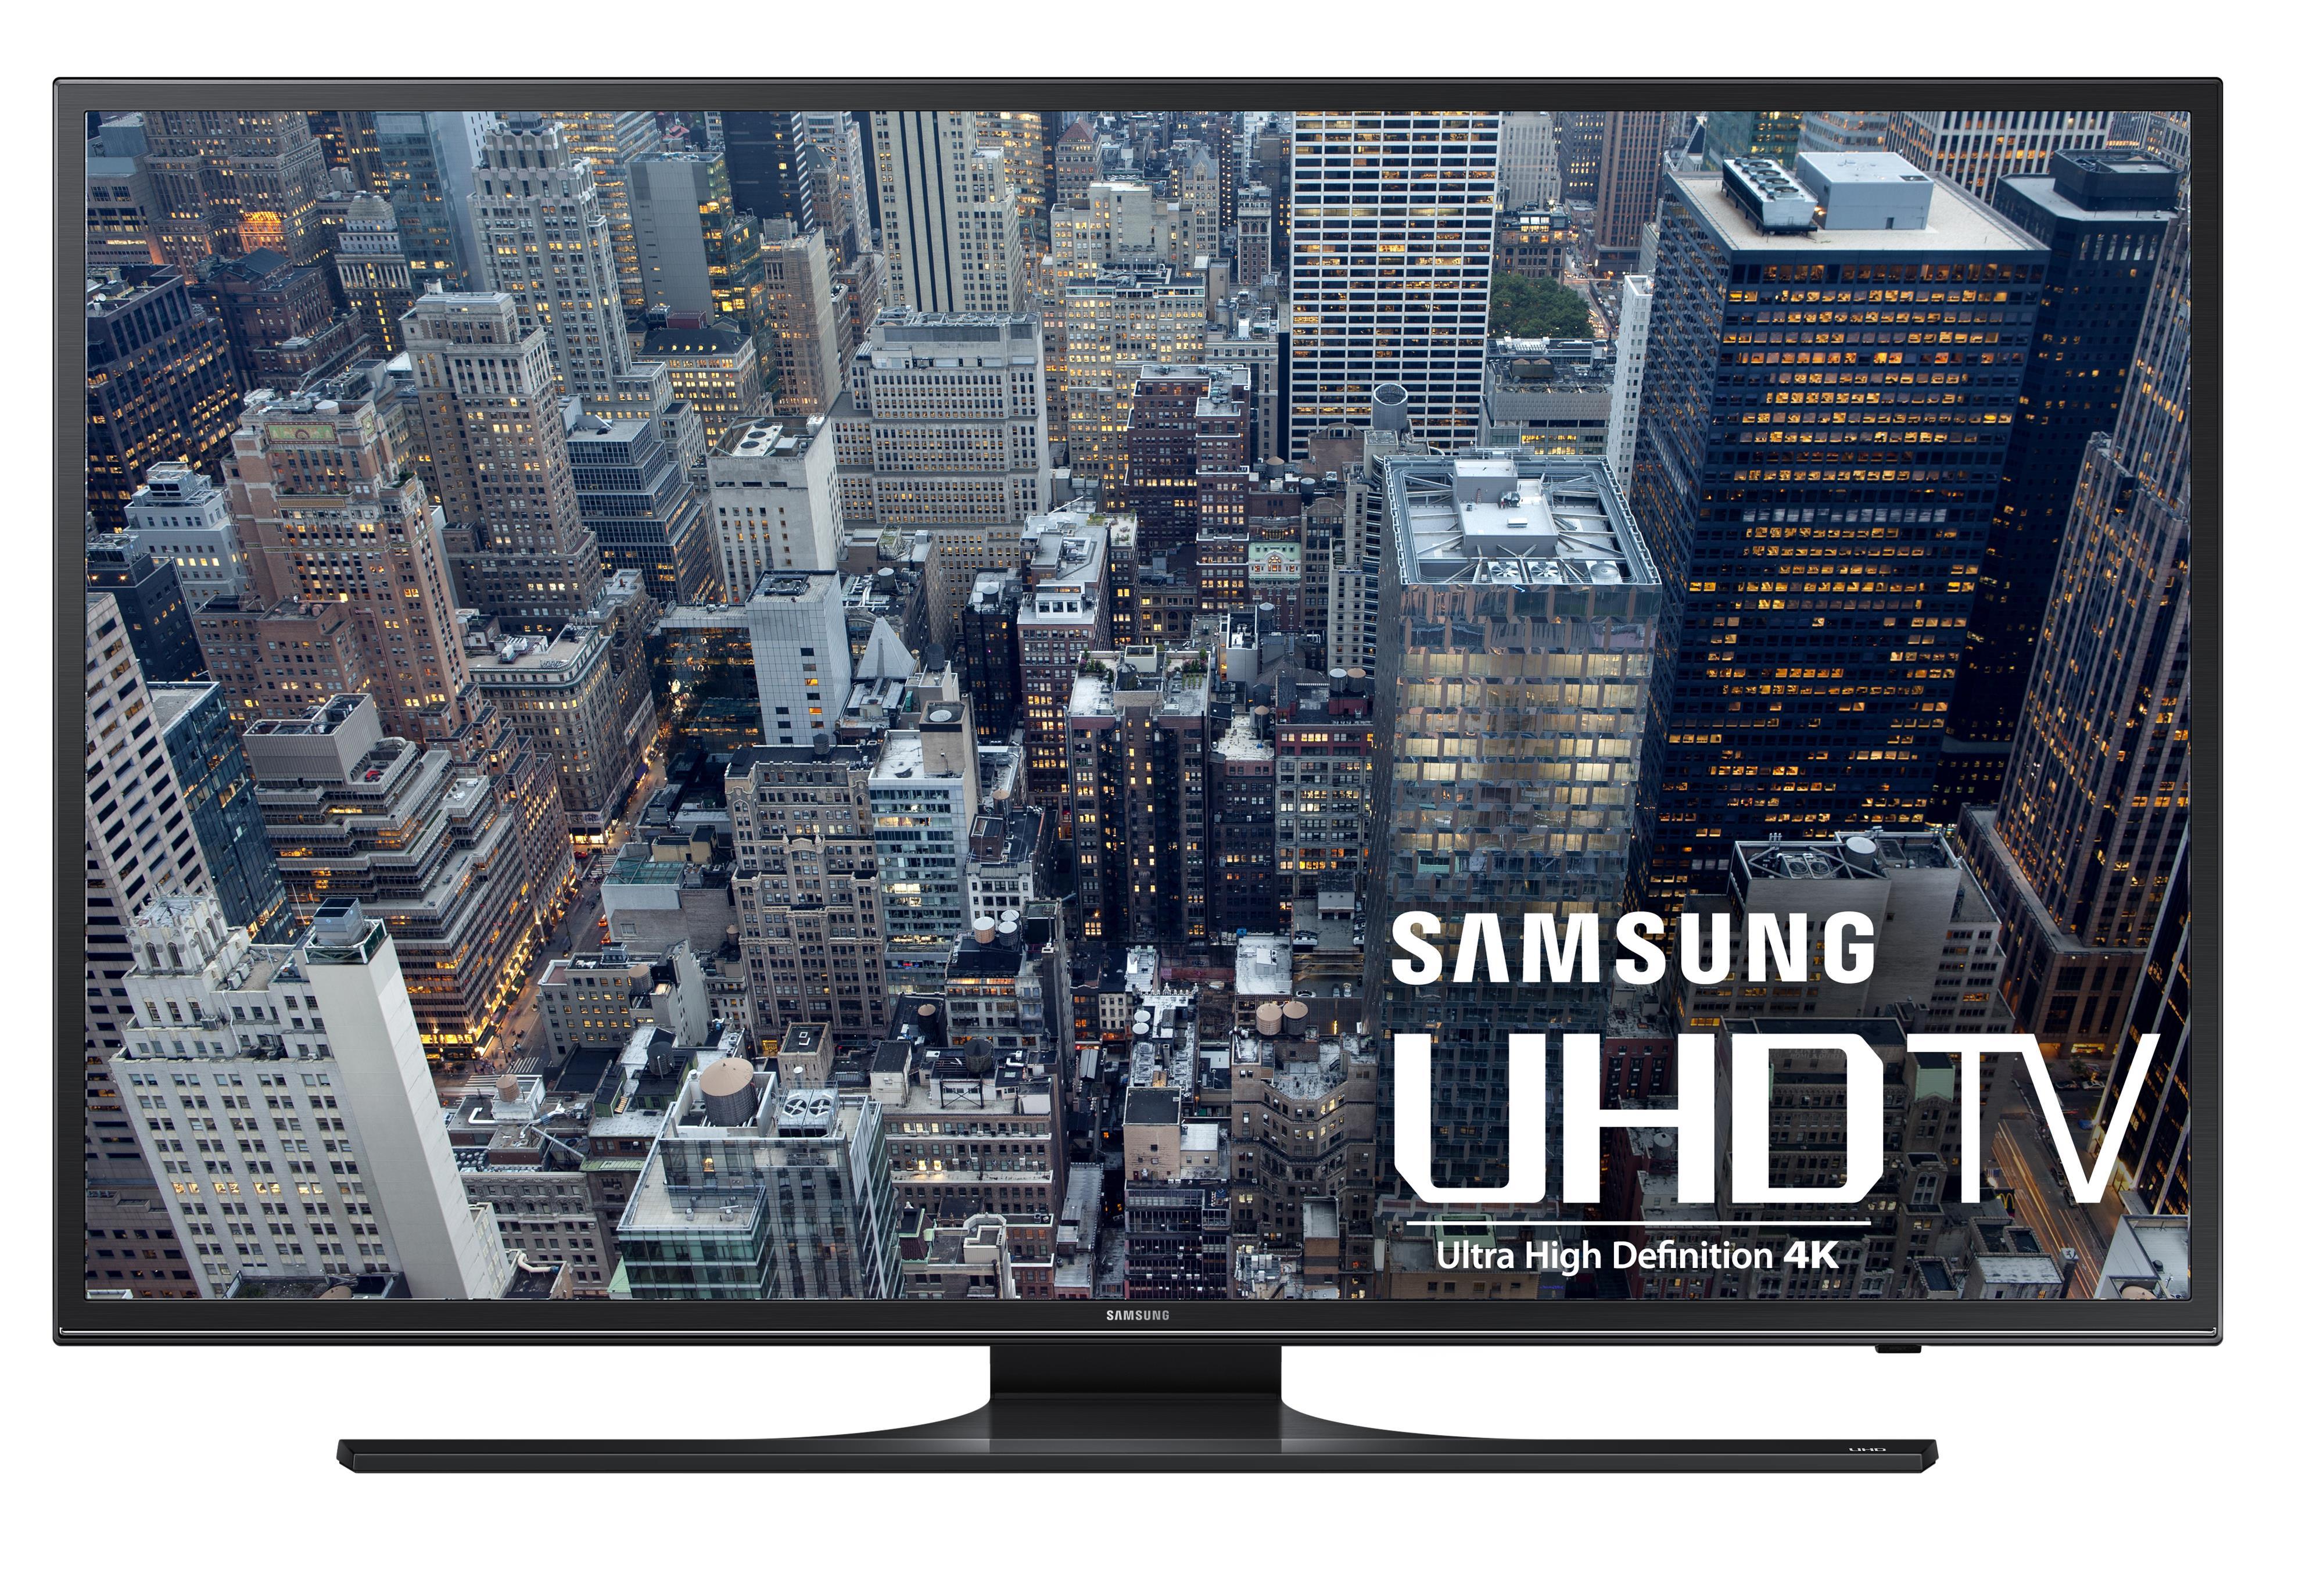 "Samsung LED TVs 2015 4K UHD JU6500 Series Smart TV - 75"" by Samsung Electronics at Wilcox Furniture"